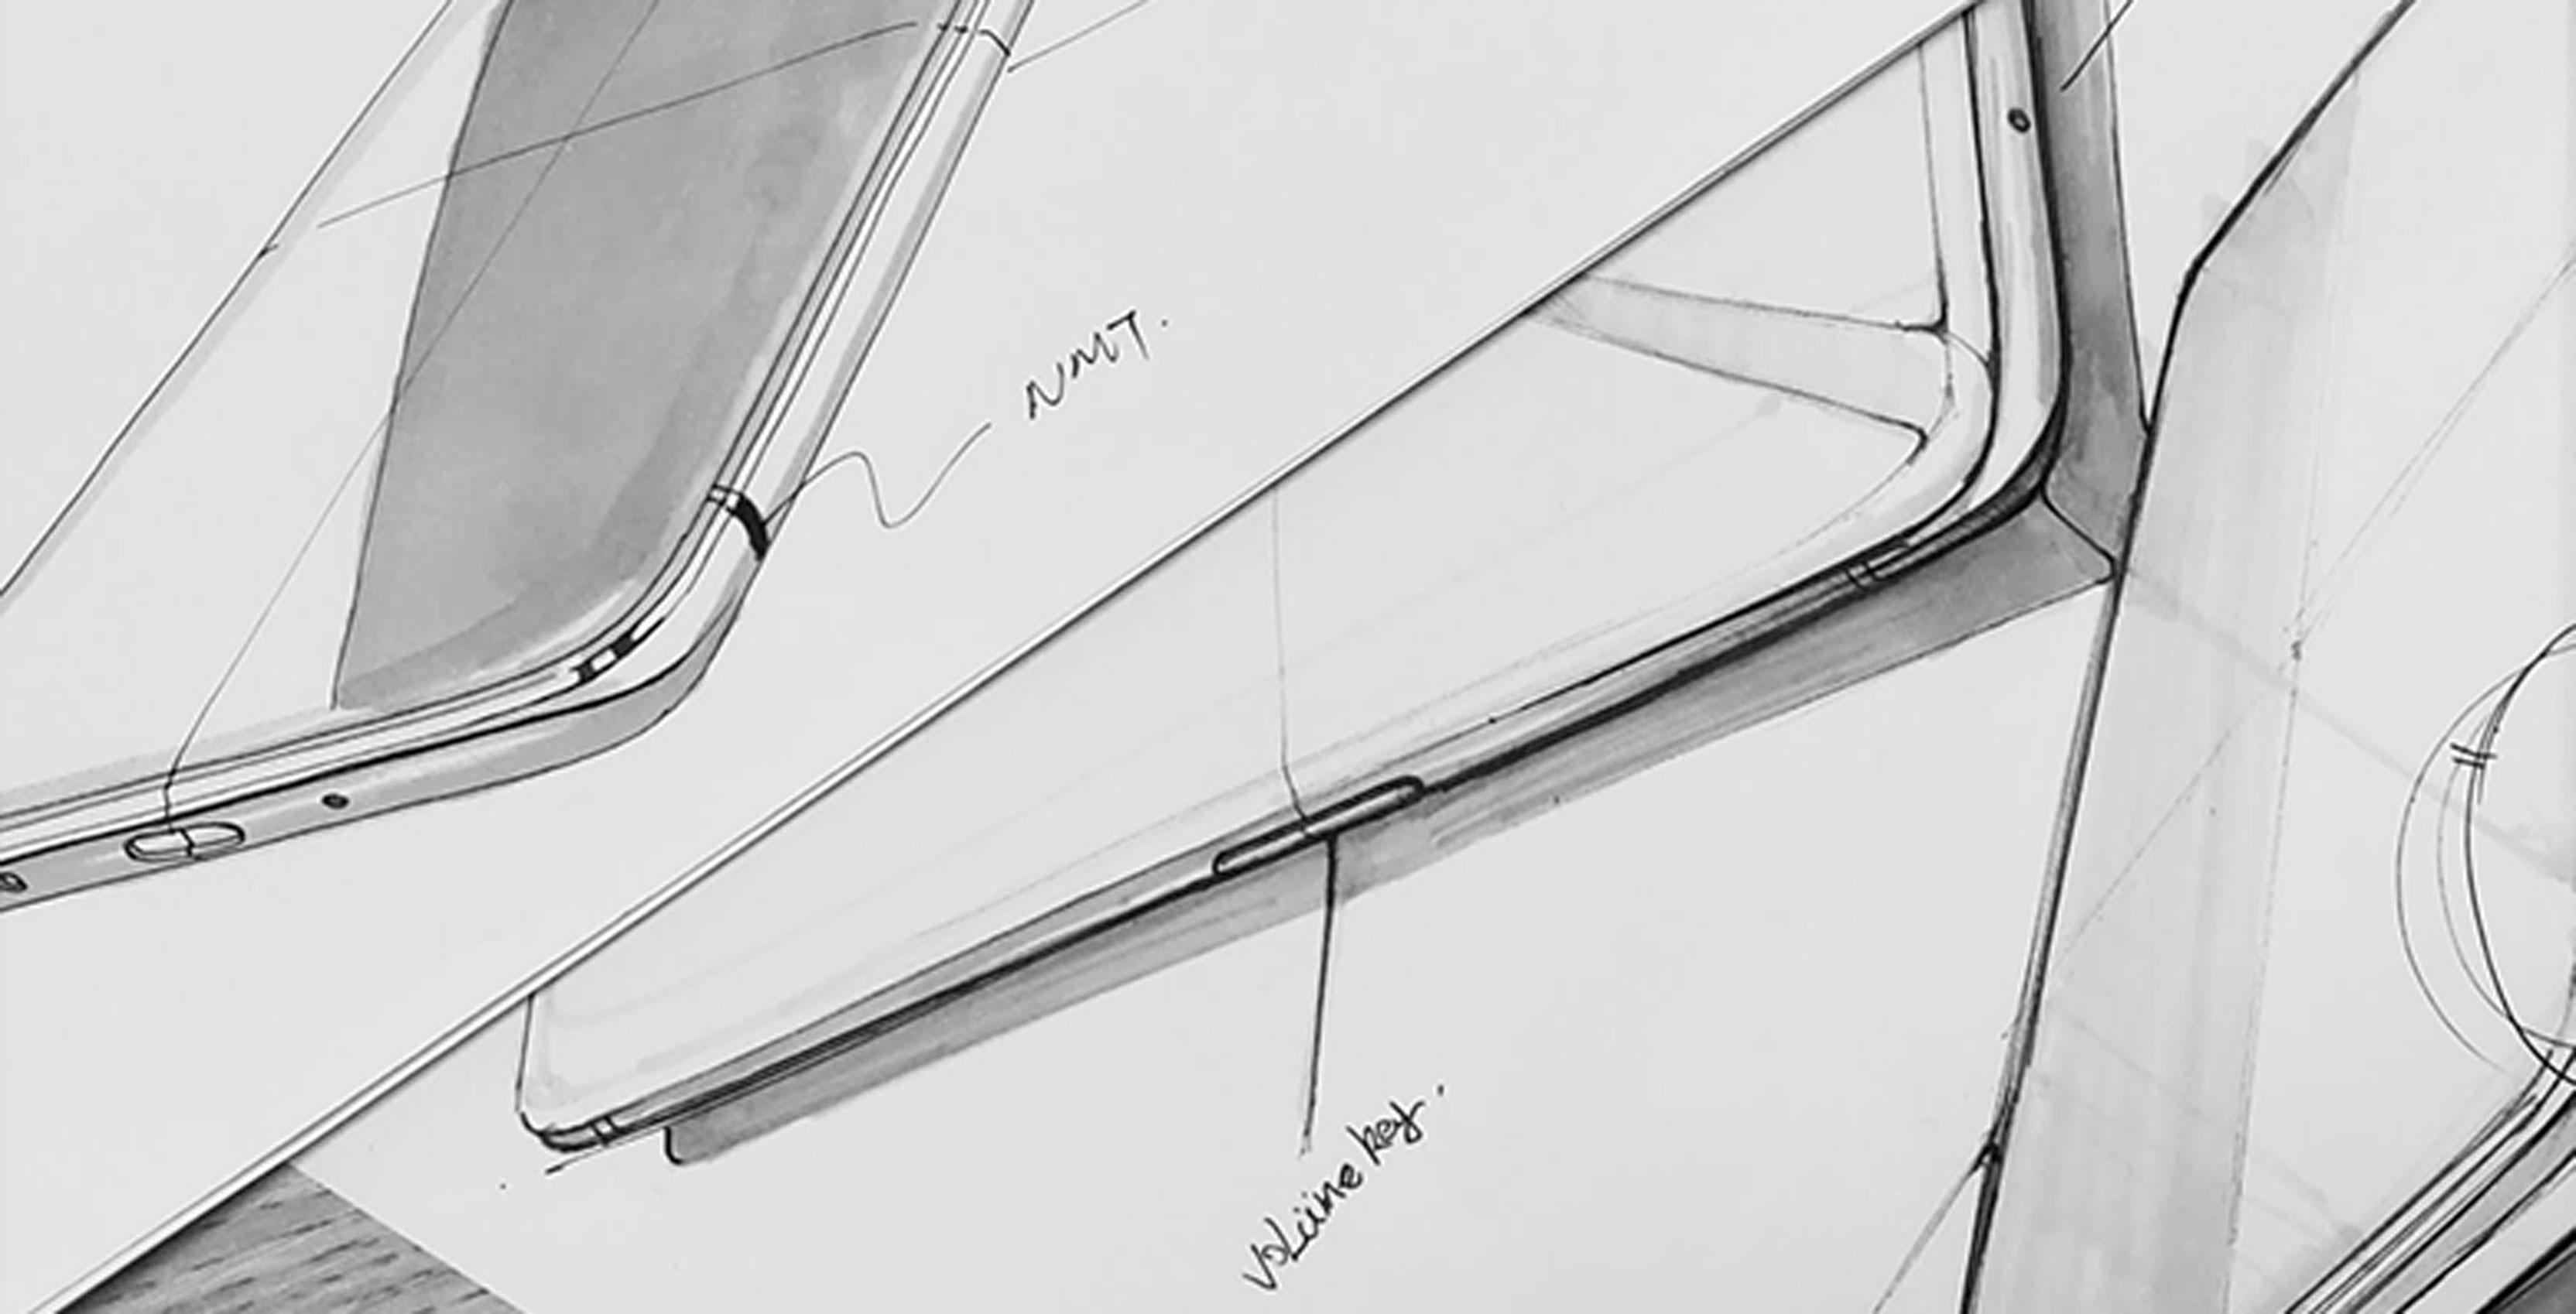 OnePlus 6 design sketch